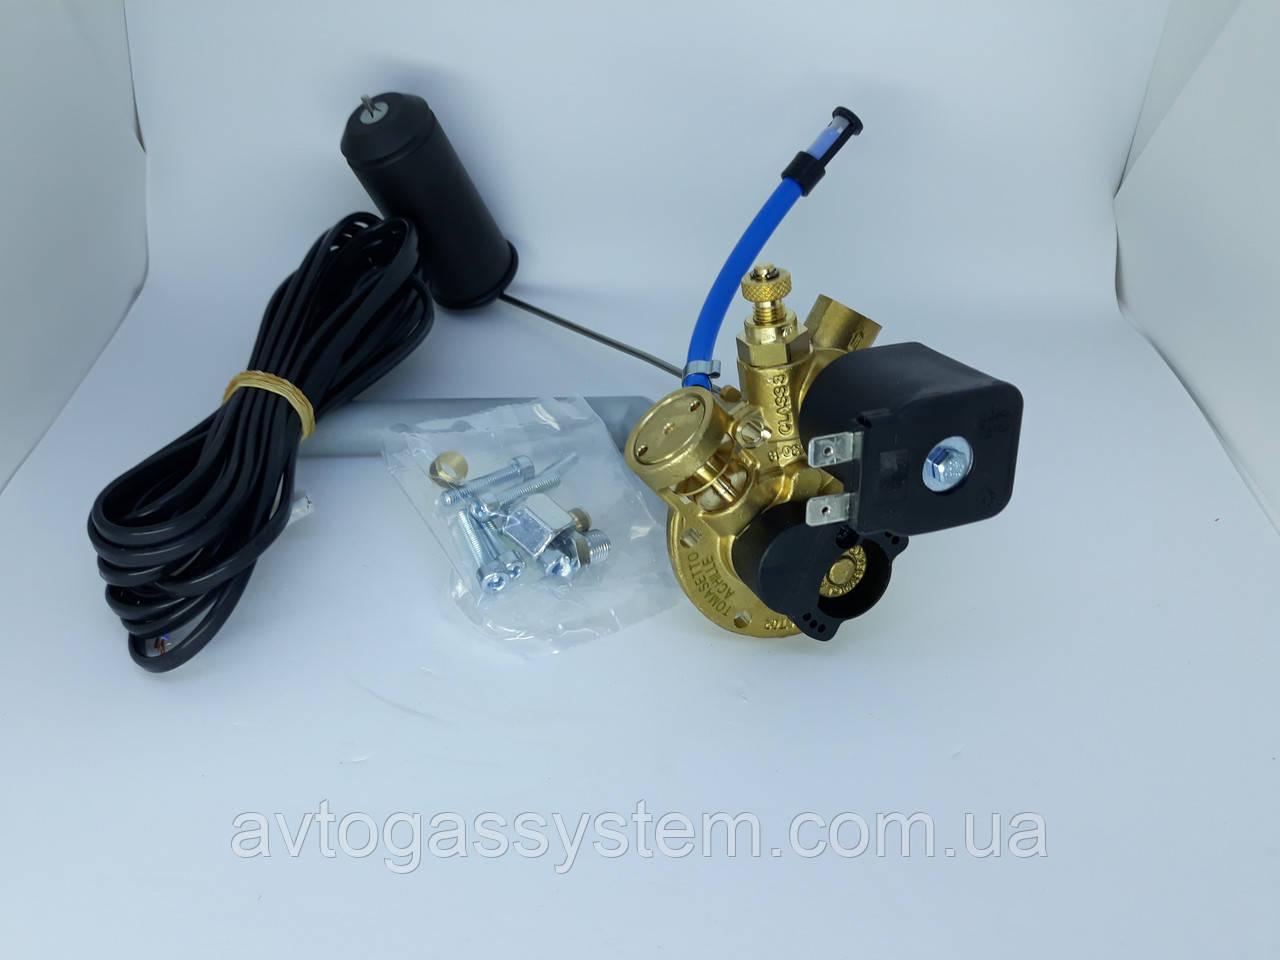 Мультиклапан Tomasetto 180-30 8х8  c катушкой без ВЗУ